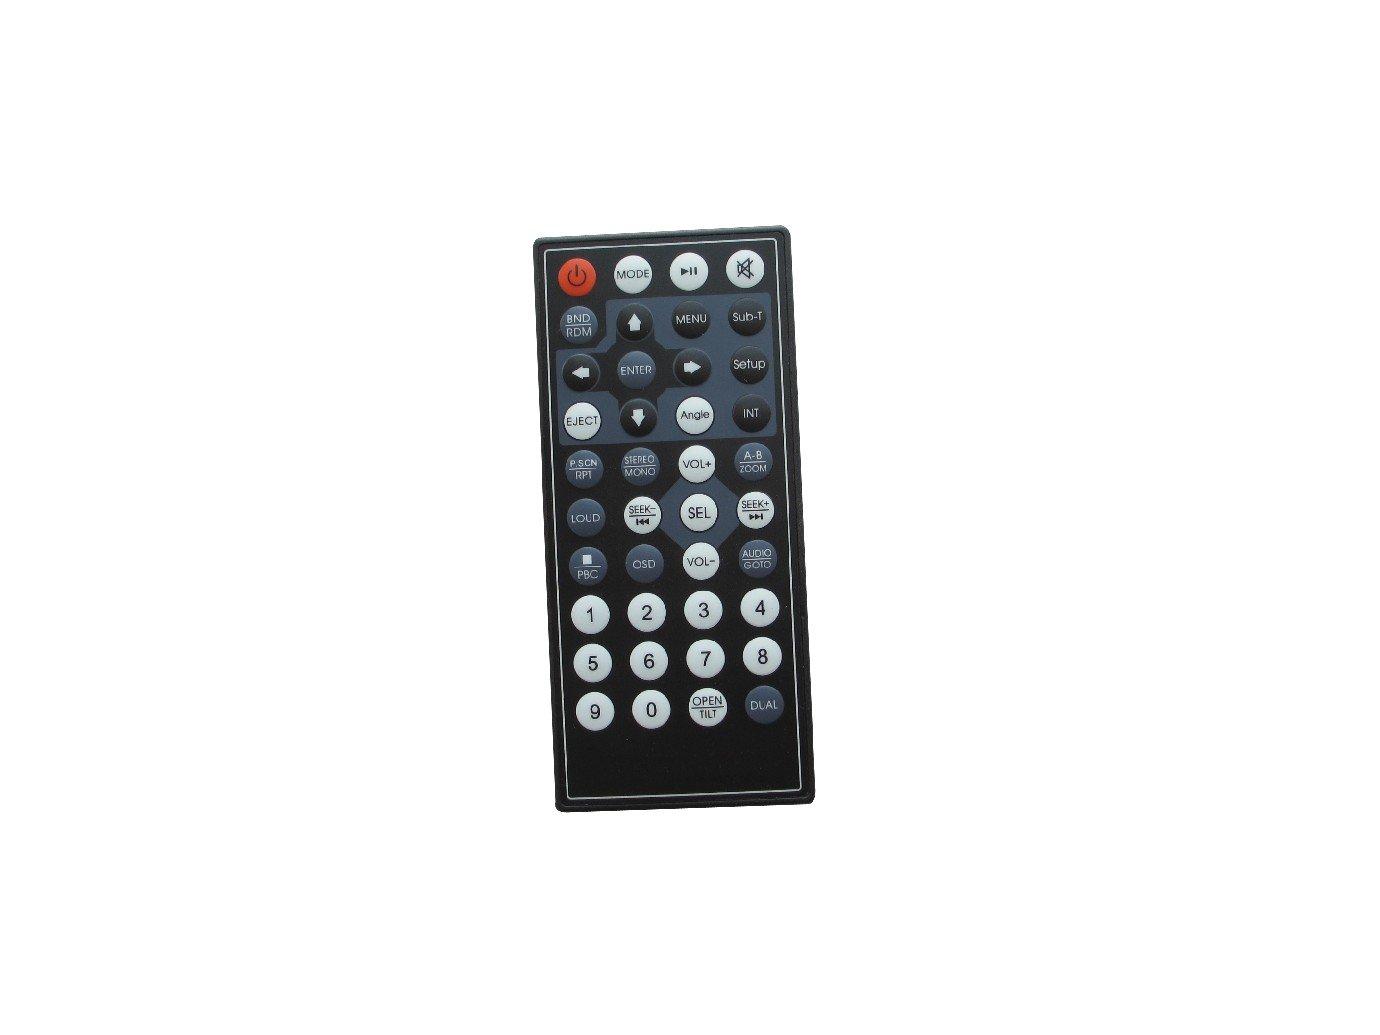 Hotsmtbang Replacement Remote Control For Soundstream VIR-7830B VR-730BT VIR-7832BI VR-931NB DVD CD USB TV FM MP3 Player Bluetooth Car Stereo Receiver